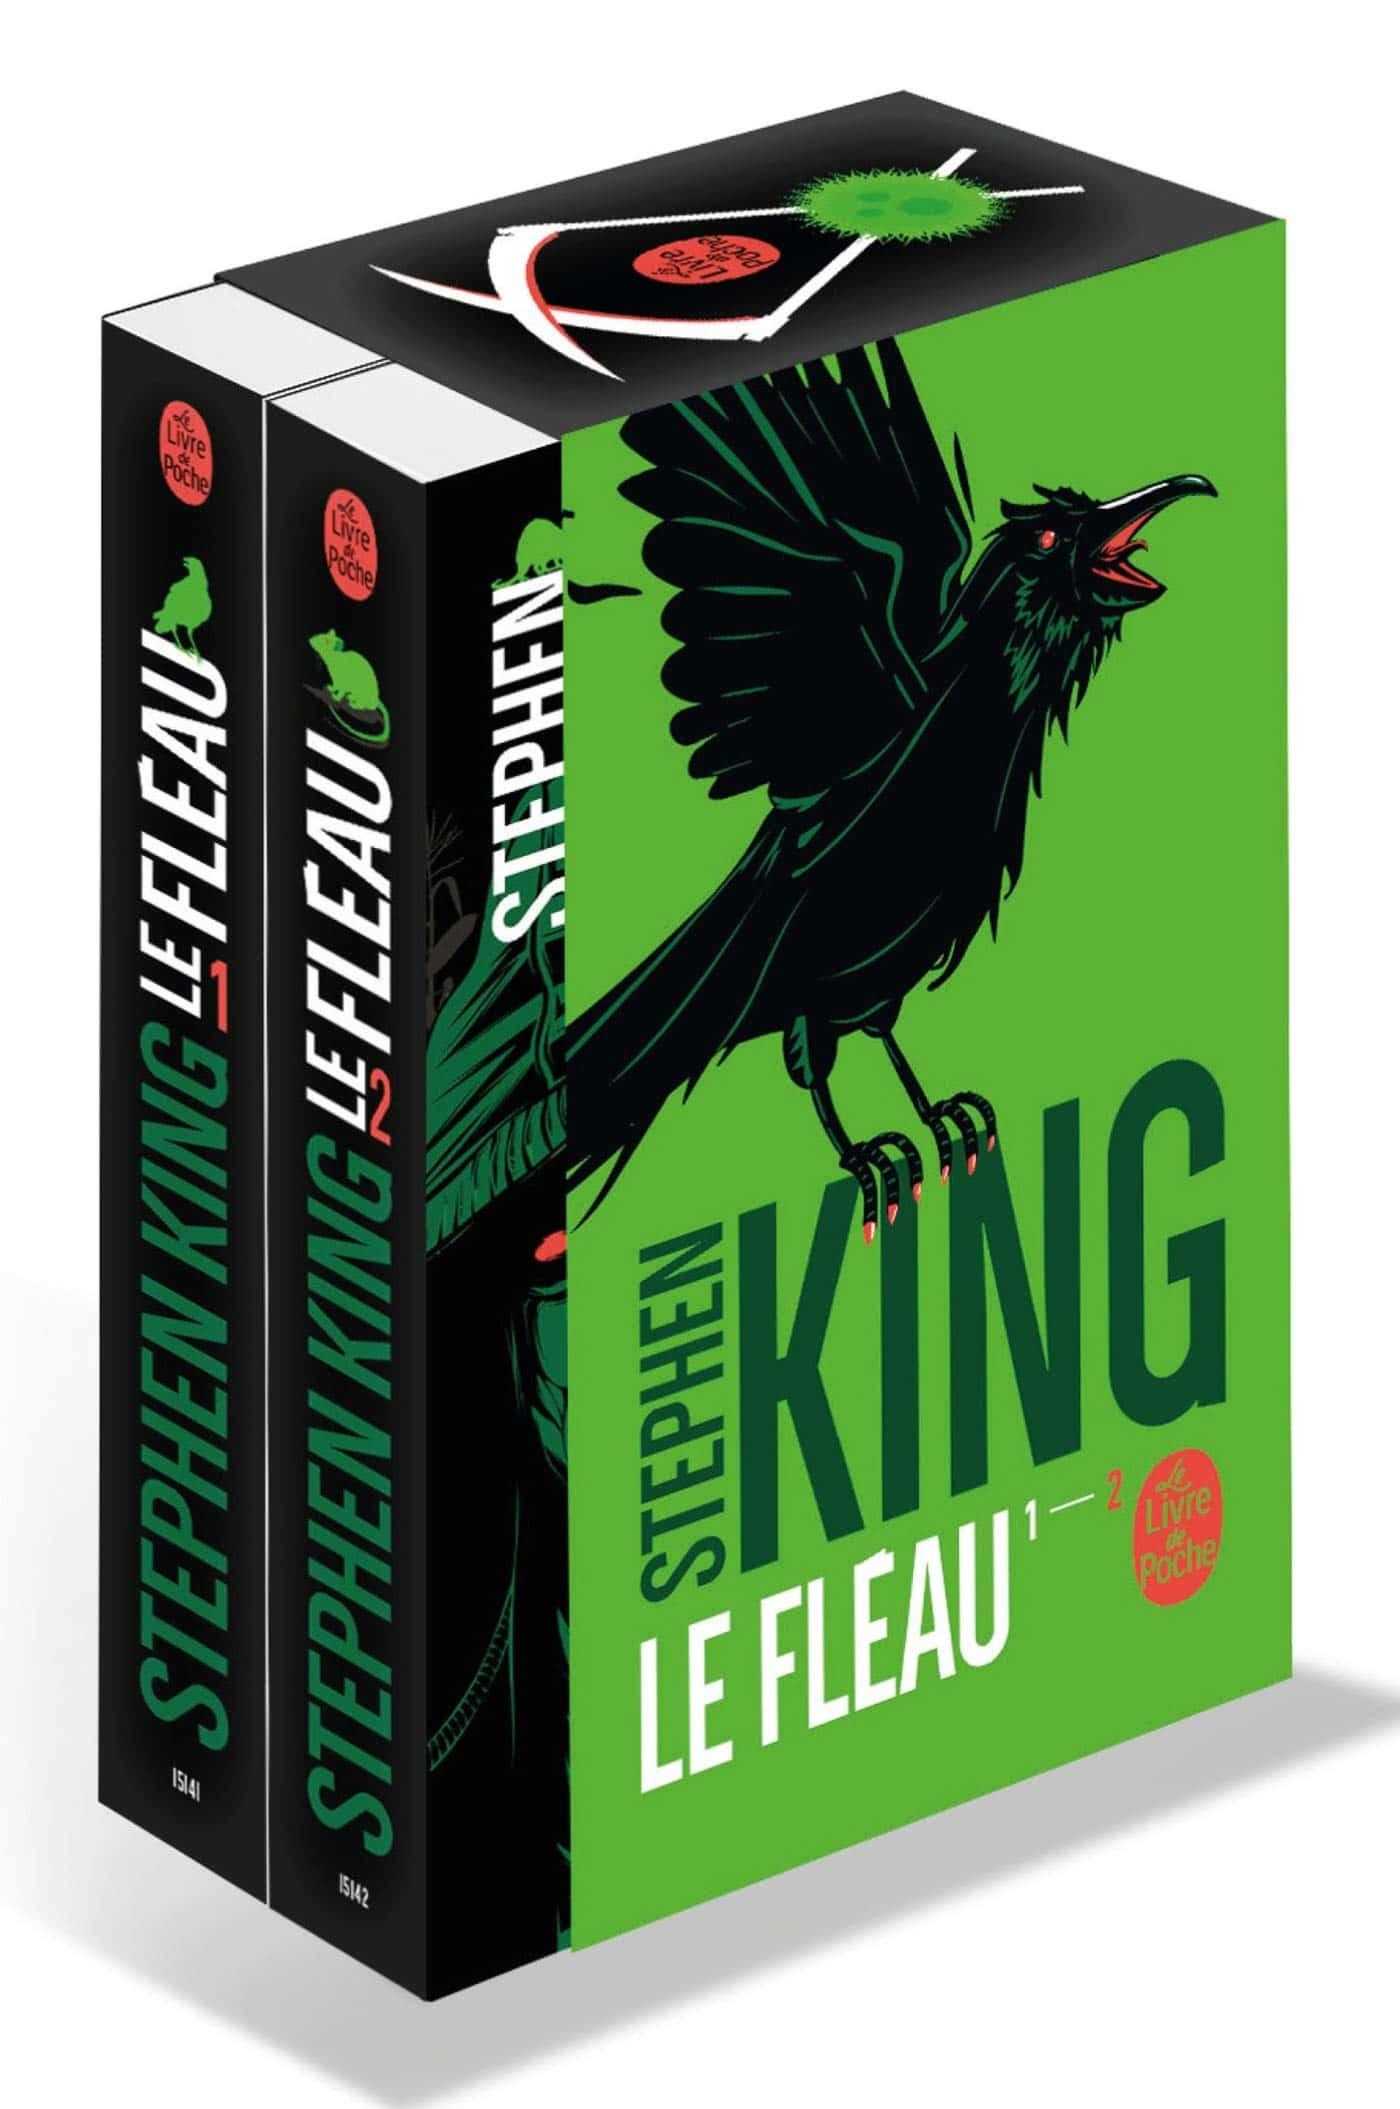 Lefleau Stephenking Editioncollector Lelivredepoche2020 01